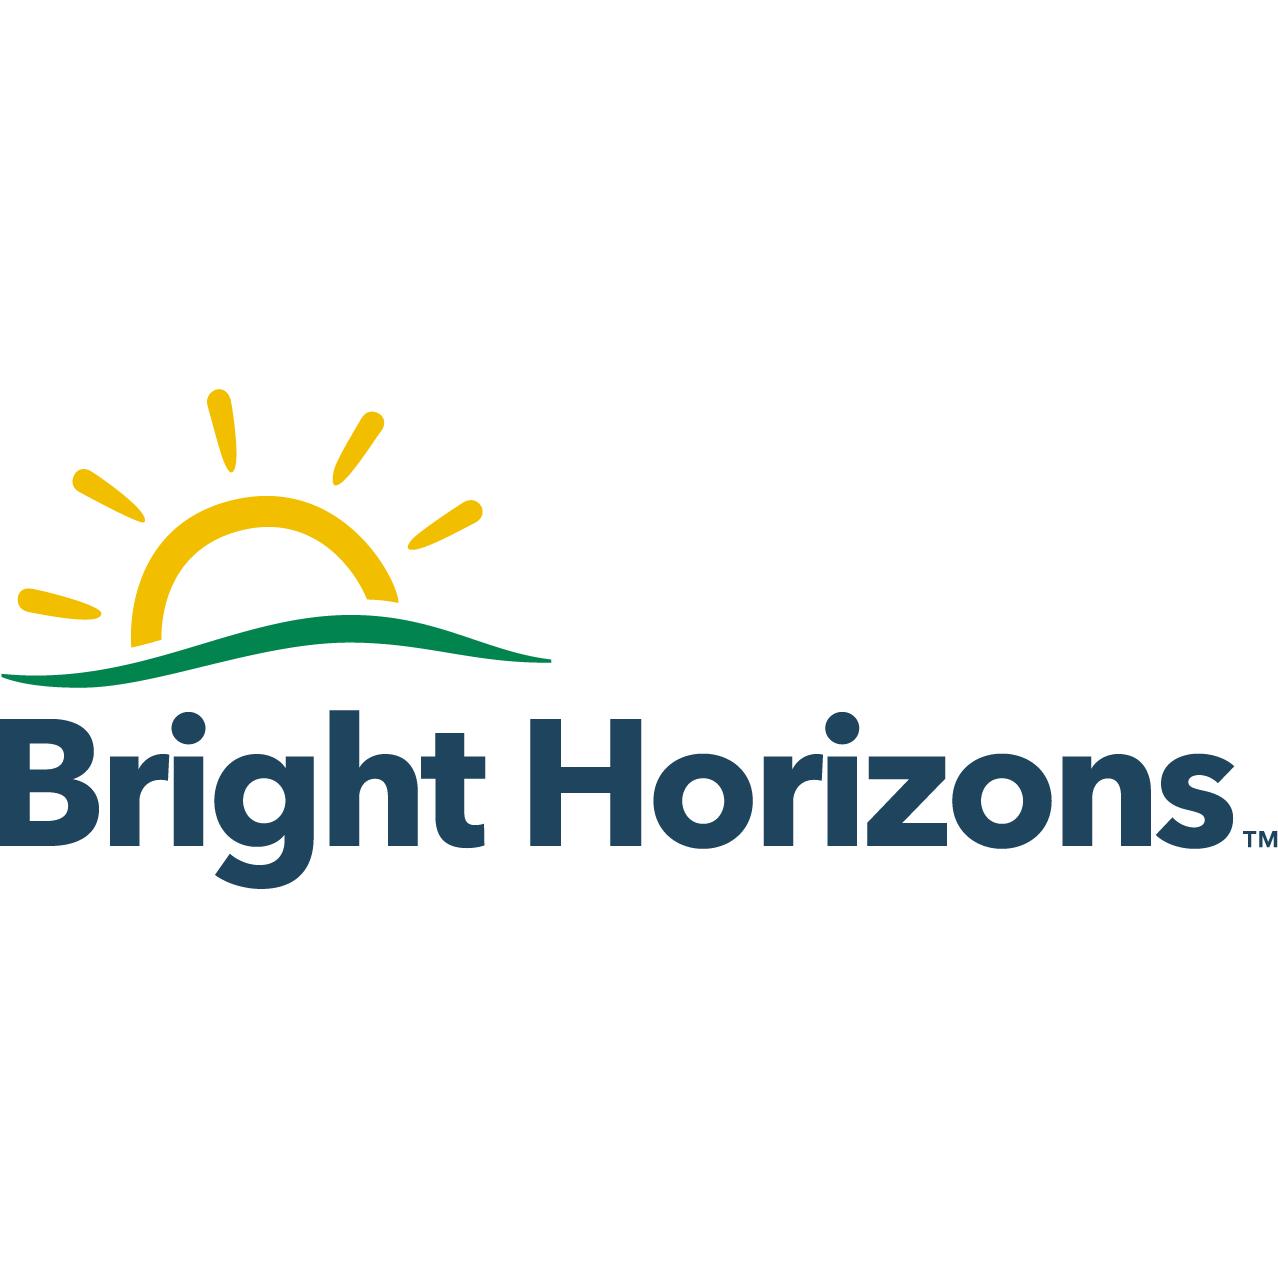 Bright Horizons Springfields Day Nursery and Preschool - Lichfield, Staffordshire WS13 7BJ - 03339 206633   ShowMeLocal.com